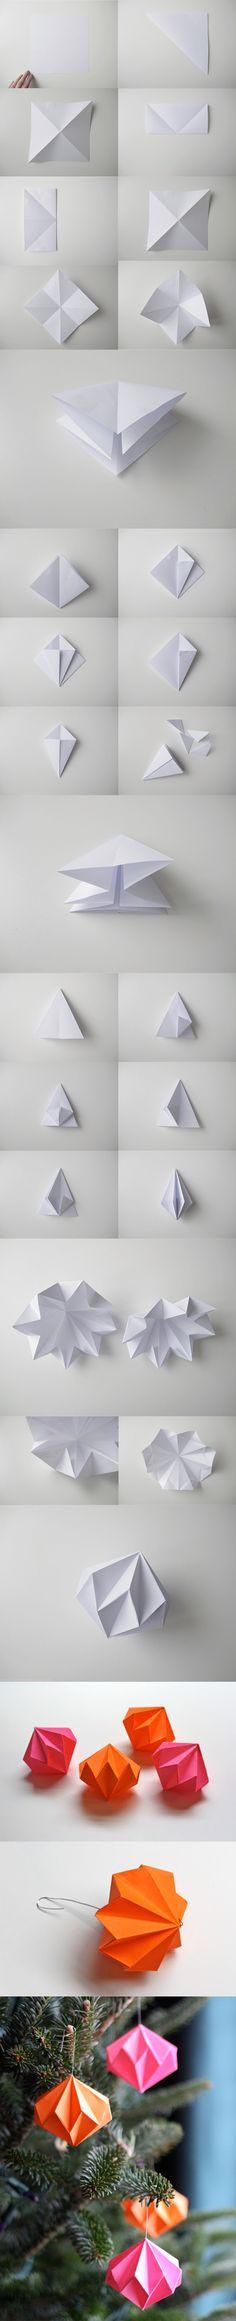 decoracion-origami-paepl-navidad-diamante-muy-ingenioso-3